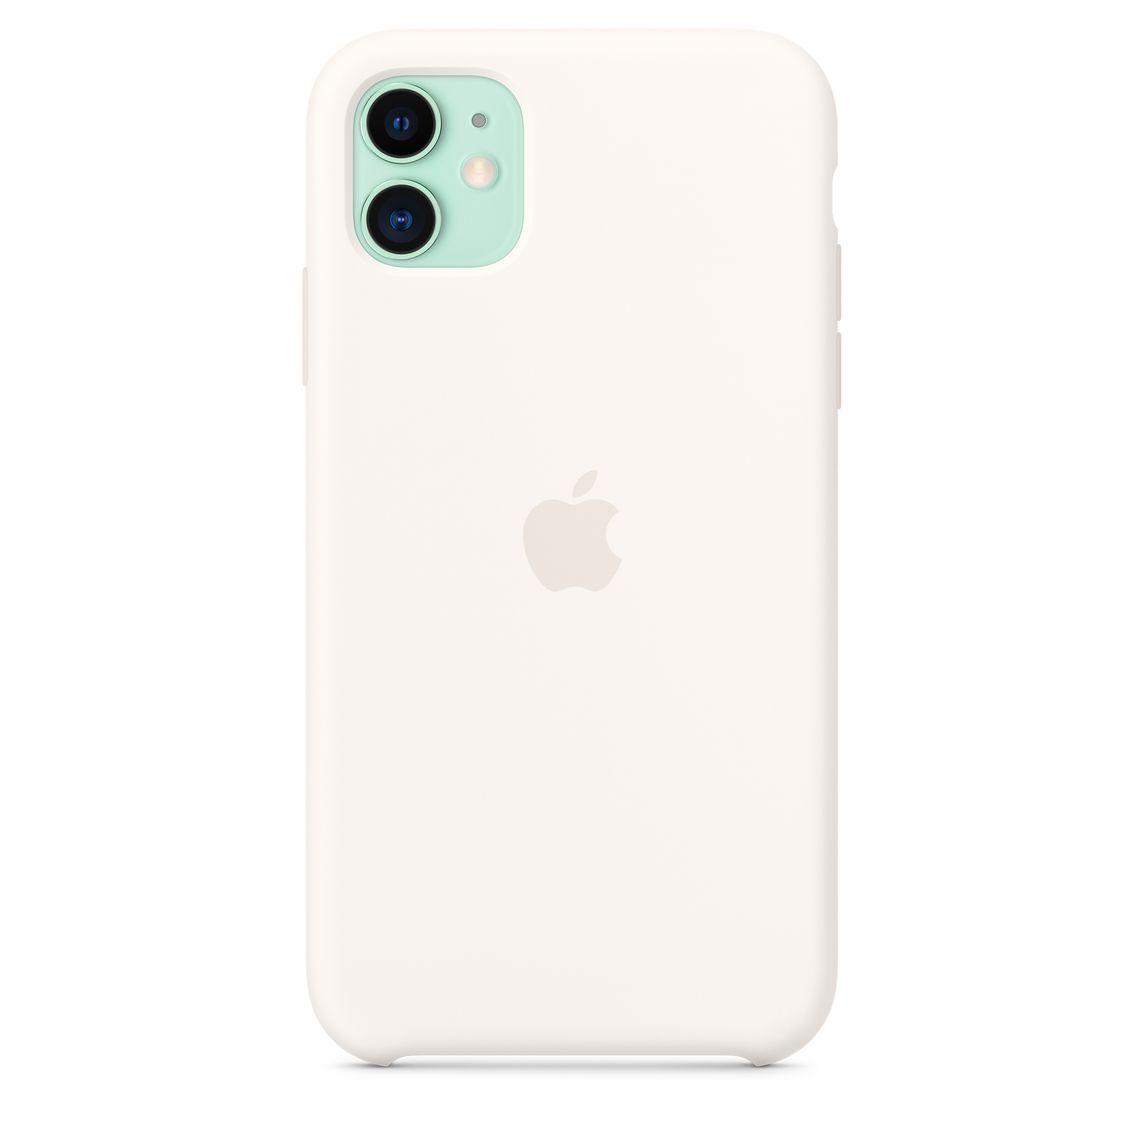 coque iphone 5 apple silicone